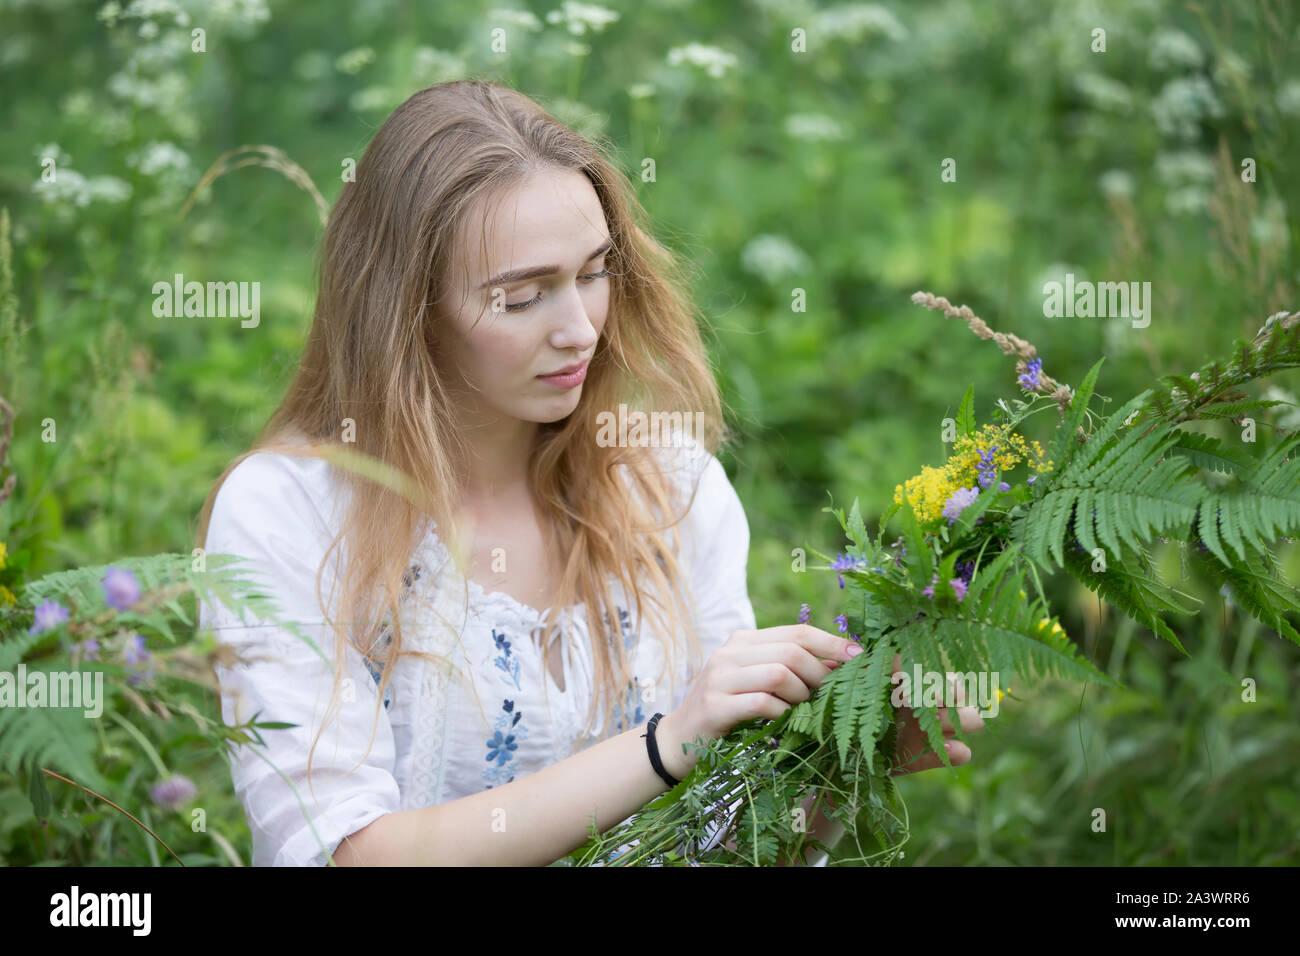 https://c8.alamy.com/comp/2A3WRR6/belarus-the-city-of-gomel-july-07-2018-holiday-kupala-the-girl-weaves-a-wreath-for-the-kupala-night-slavic-summer-holidays-belarusian-or-ukrain-2A3WRR6.jpg